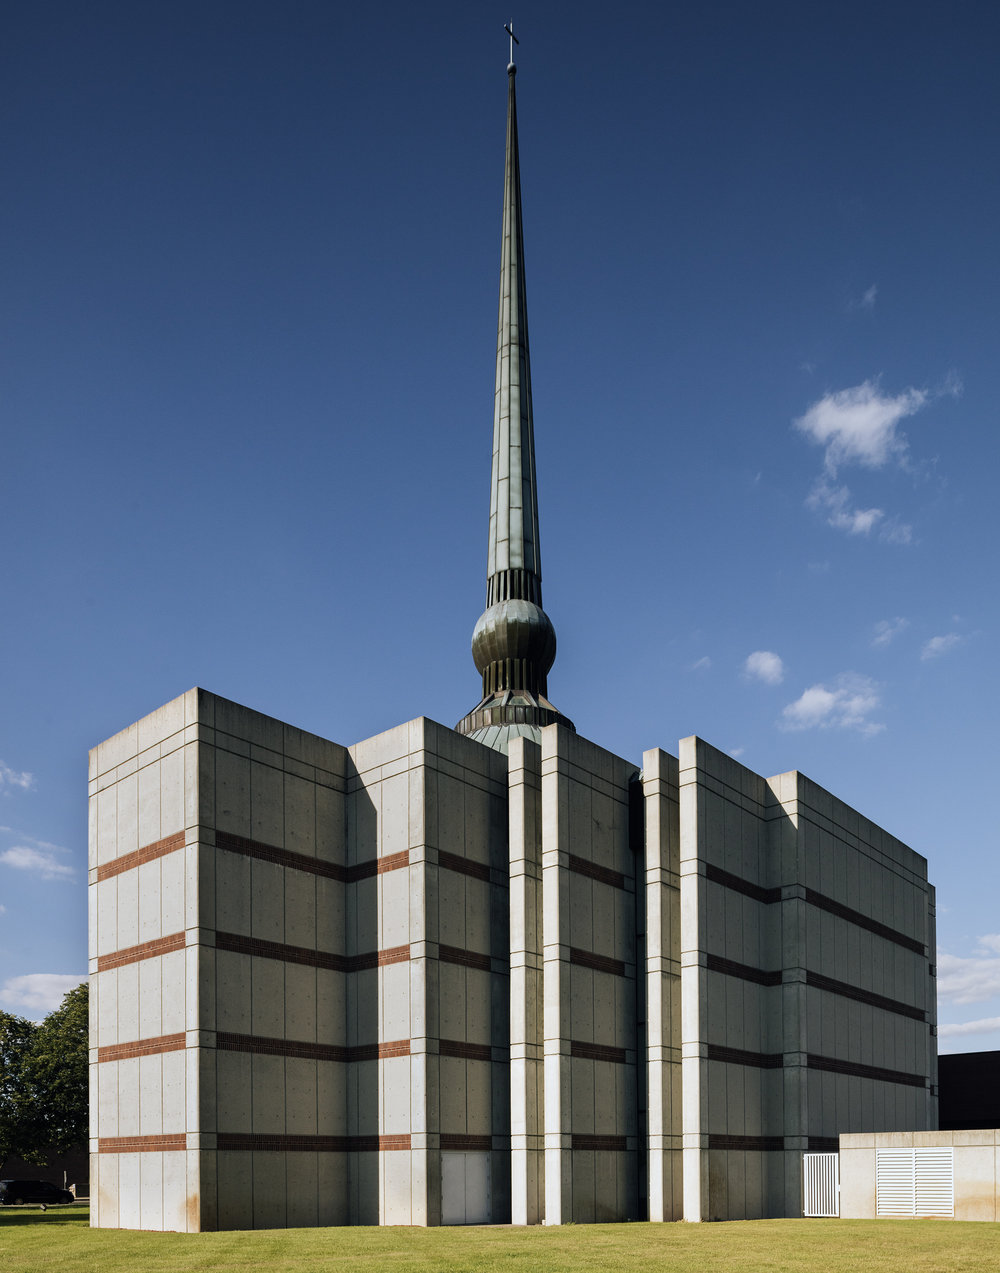 St. Peter's Lutheran Church, designed by Gunnar Birkerts, 1988.